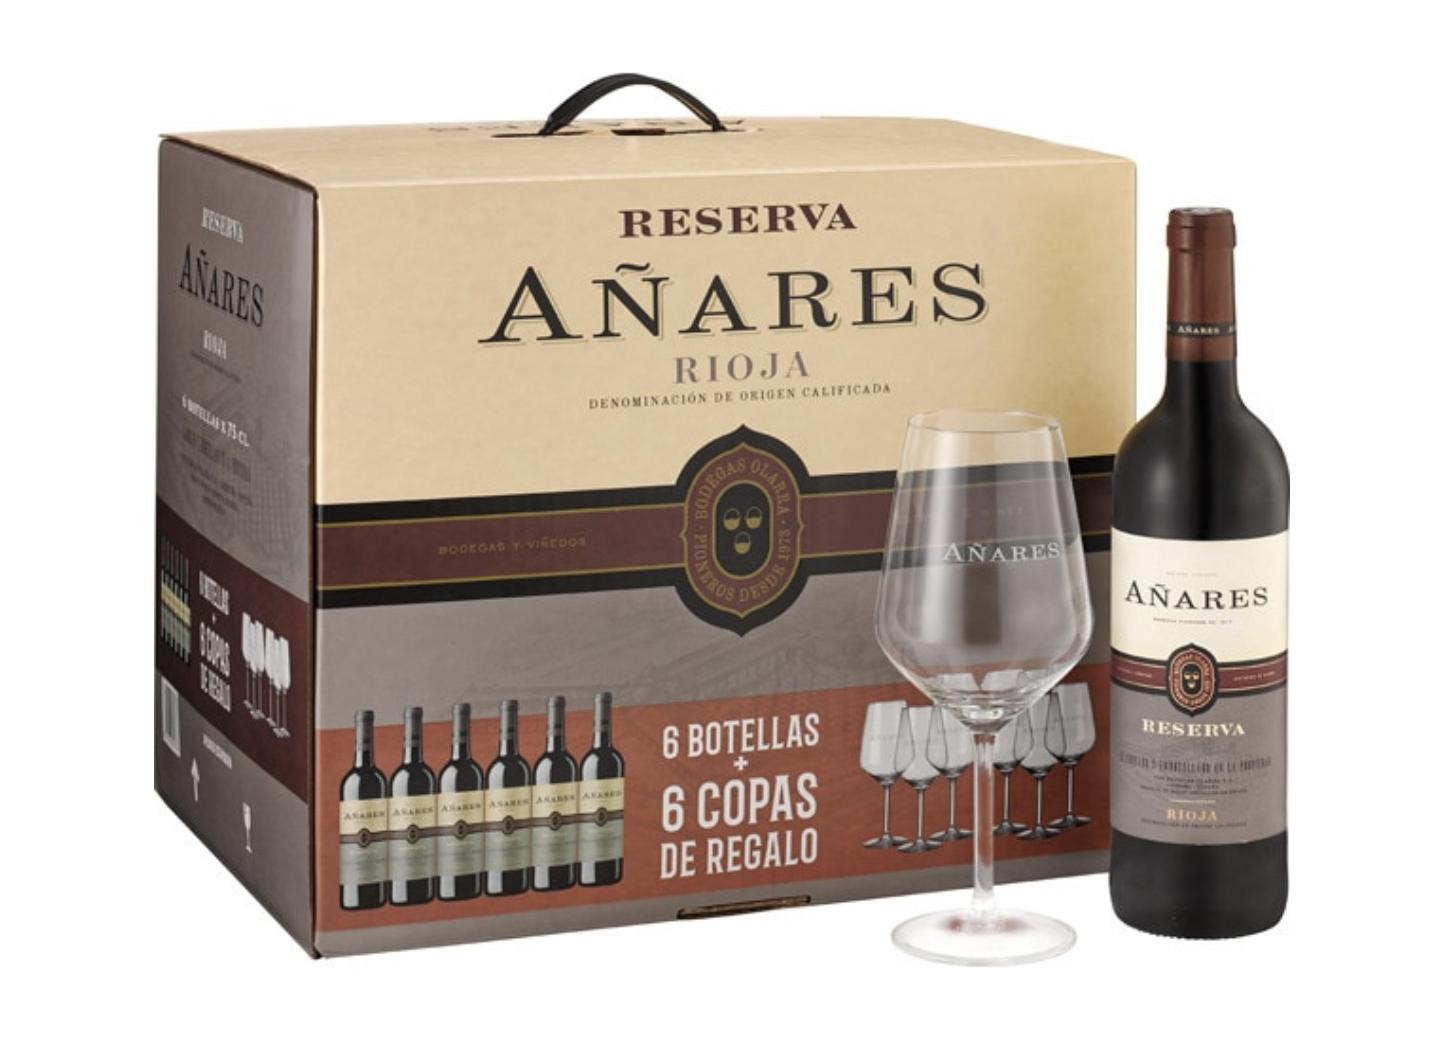 6 botellas tinto Rioja Añares Reserva + 6 copas de vino